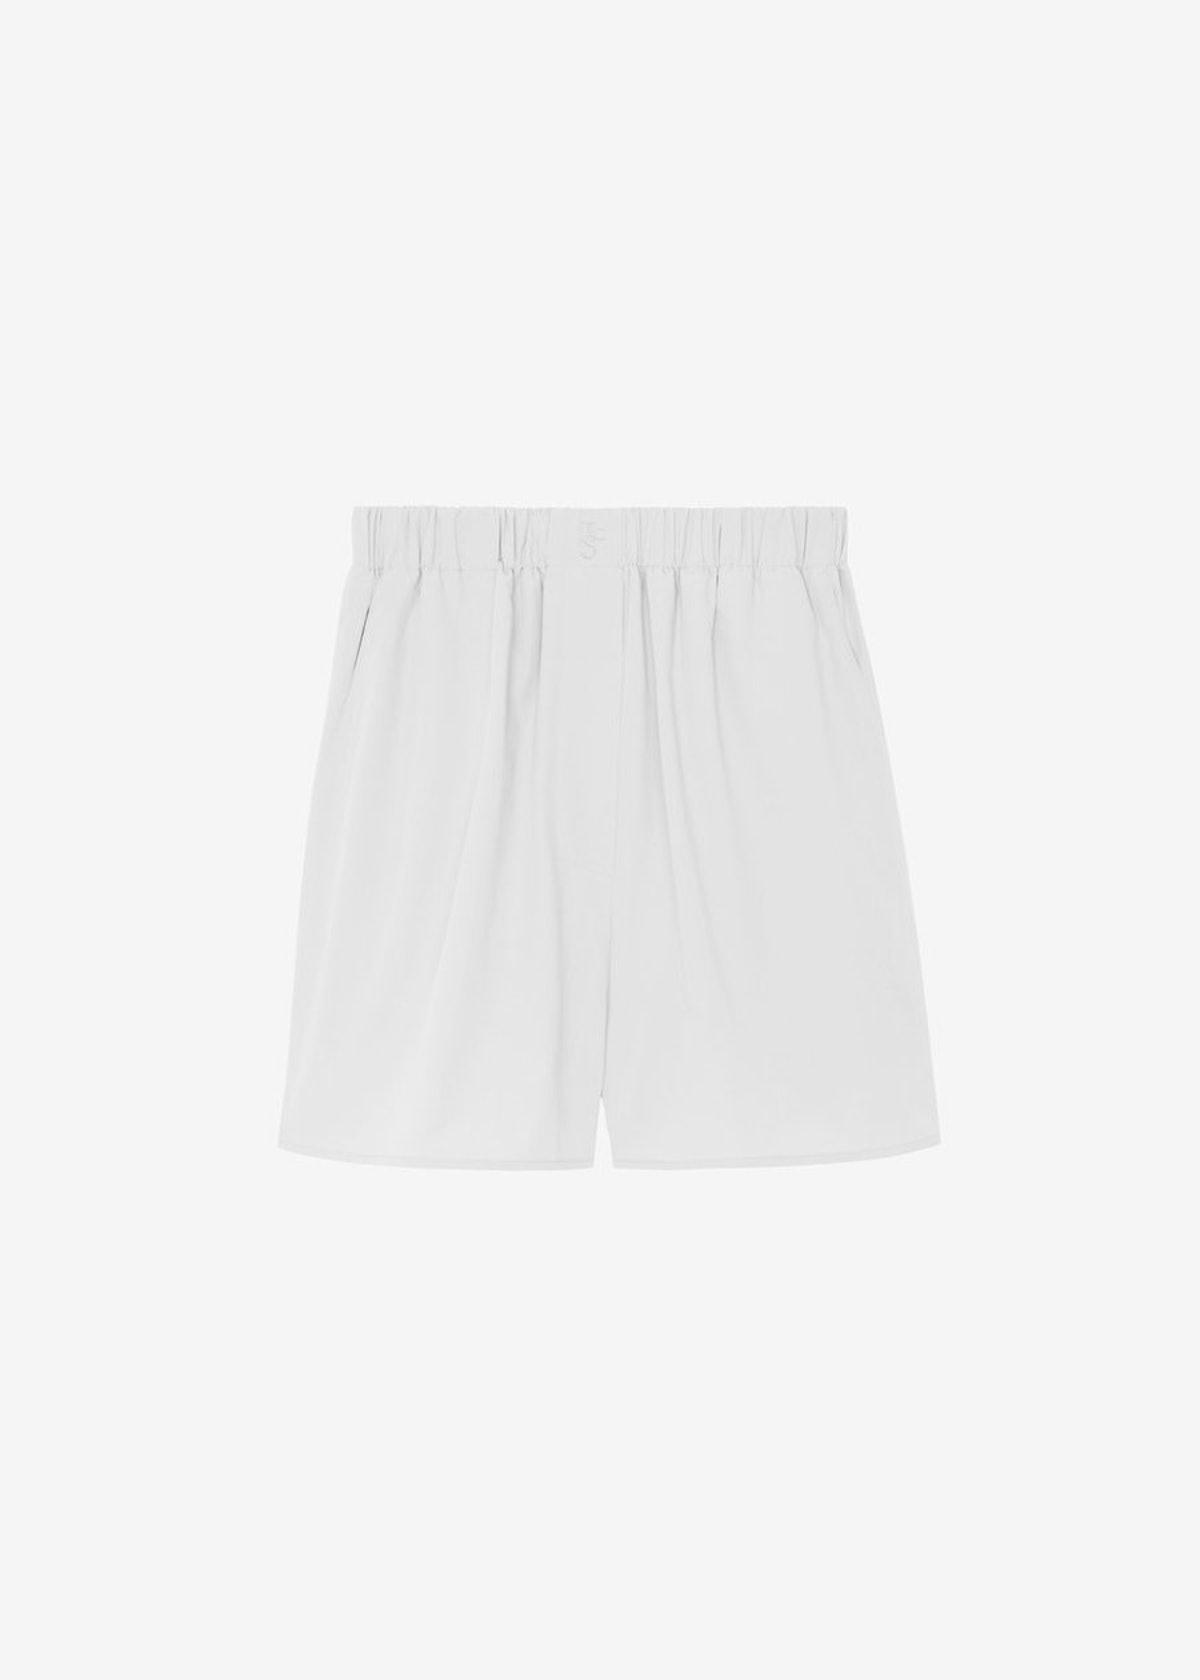 Lui Organic Cotton Boxer Short in White